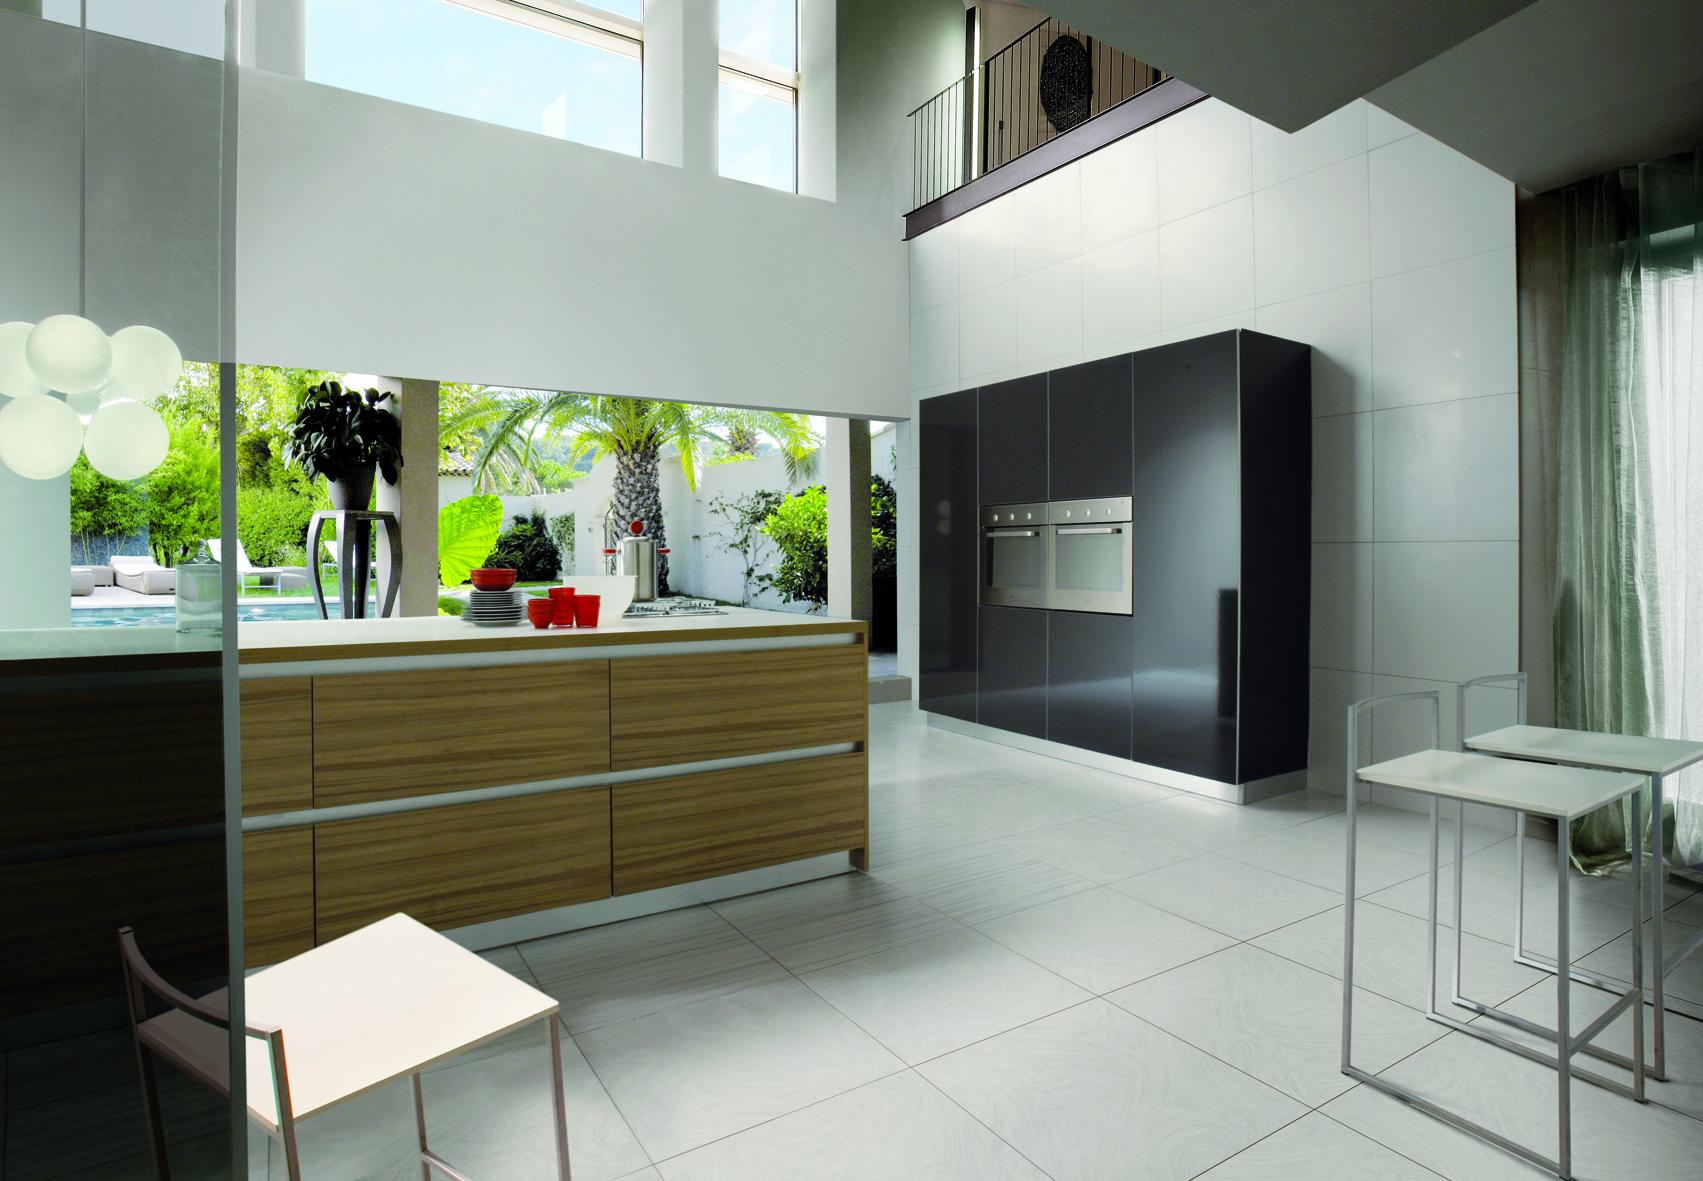 Bodenbelag Küche Reiter Fliesen